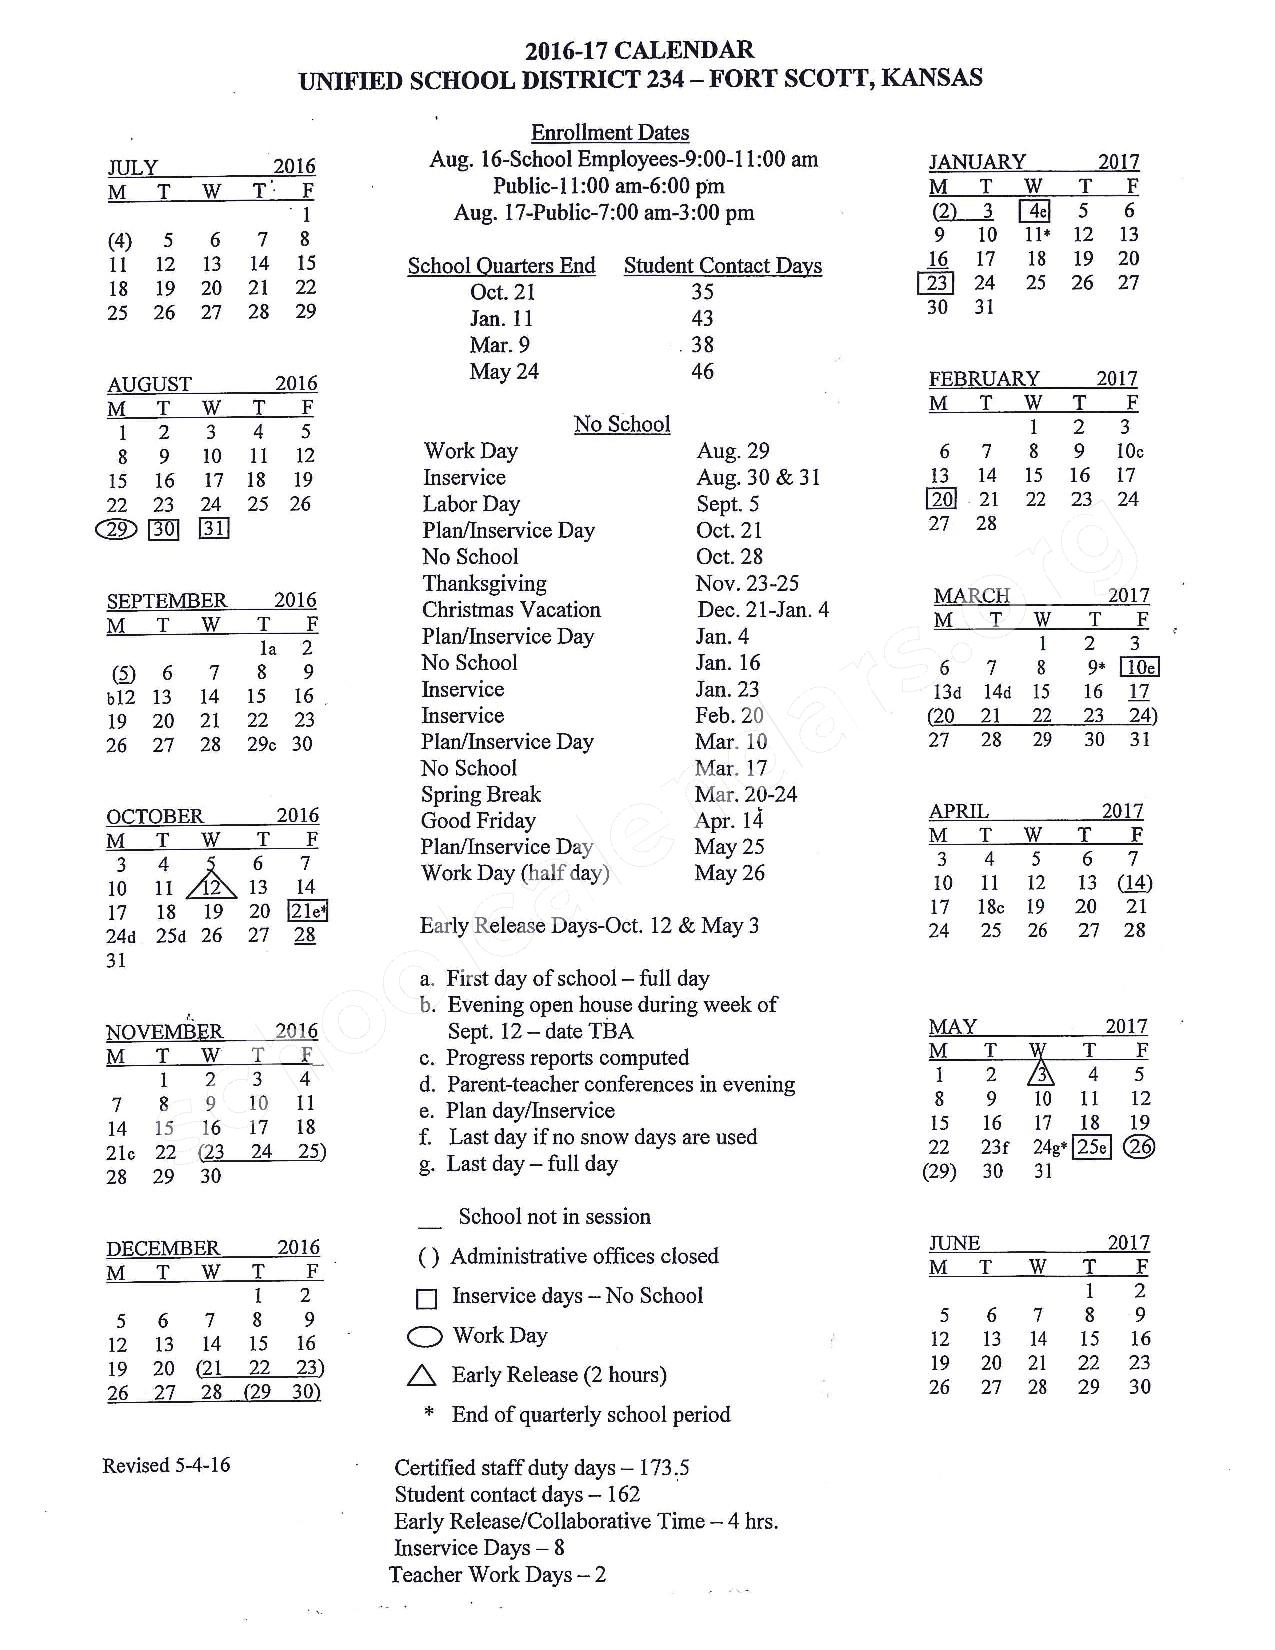 2016 - 2017 School Calendar – Fort Scott Unified School District 234 – page 1